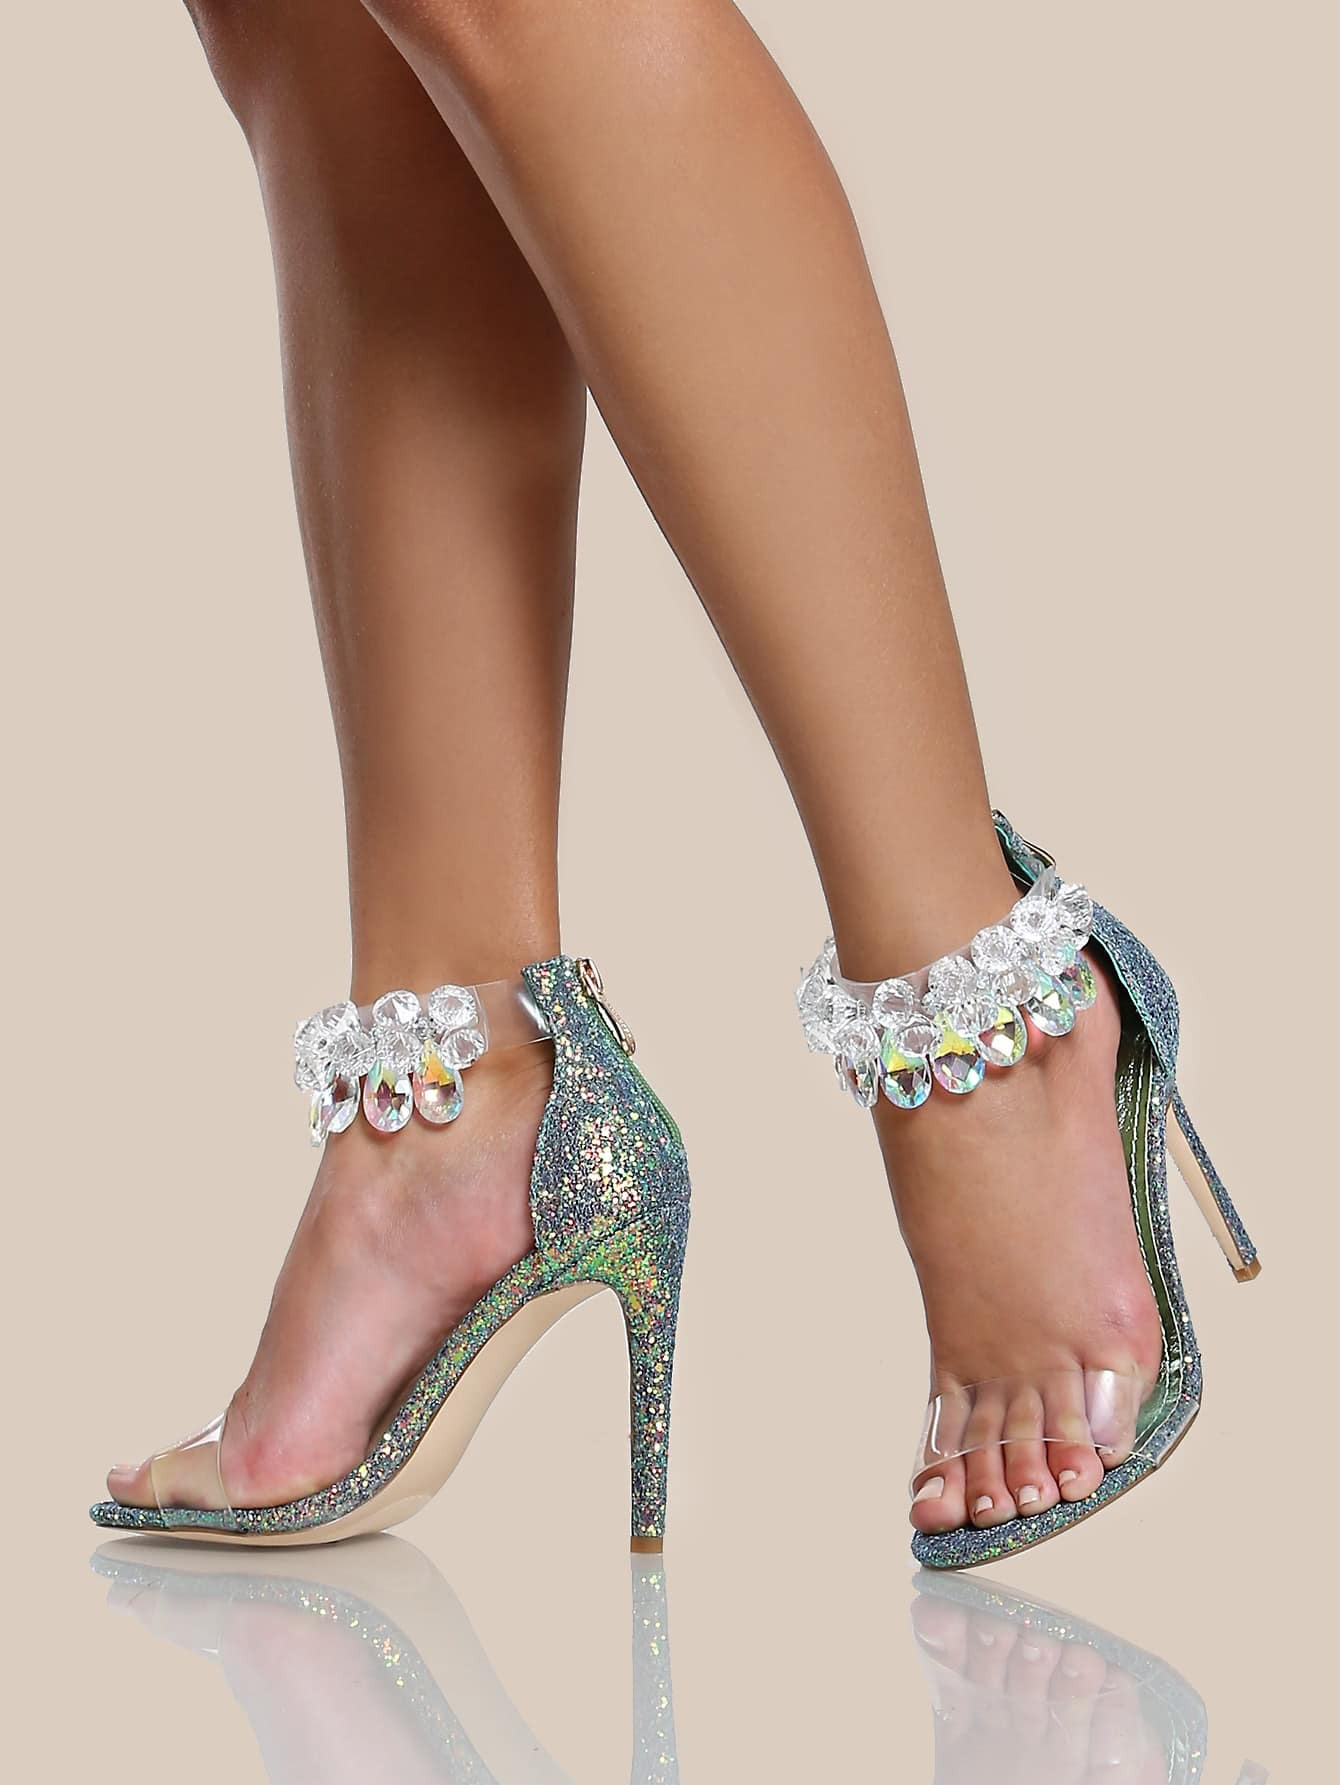 high heel shoe chair value city cover rentals albuquerque clear diamond studded strap glitter mermaid shein